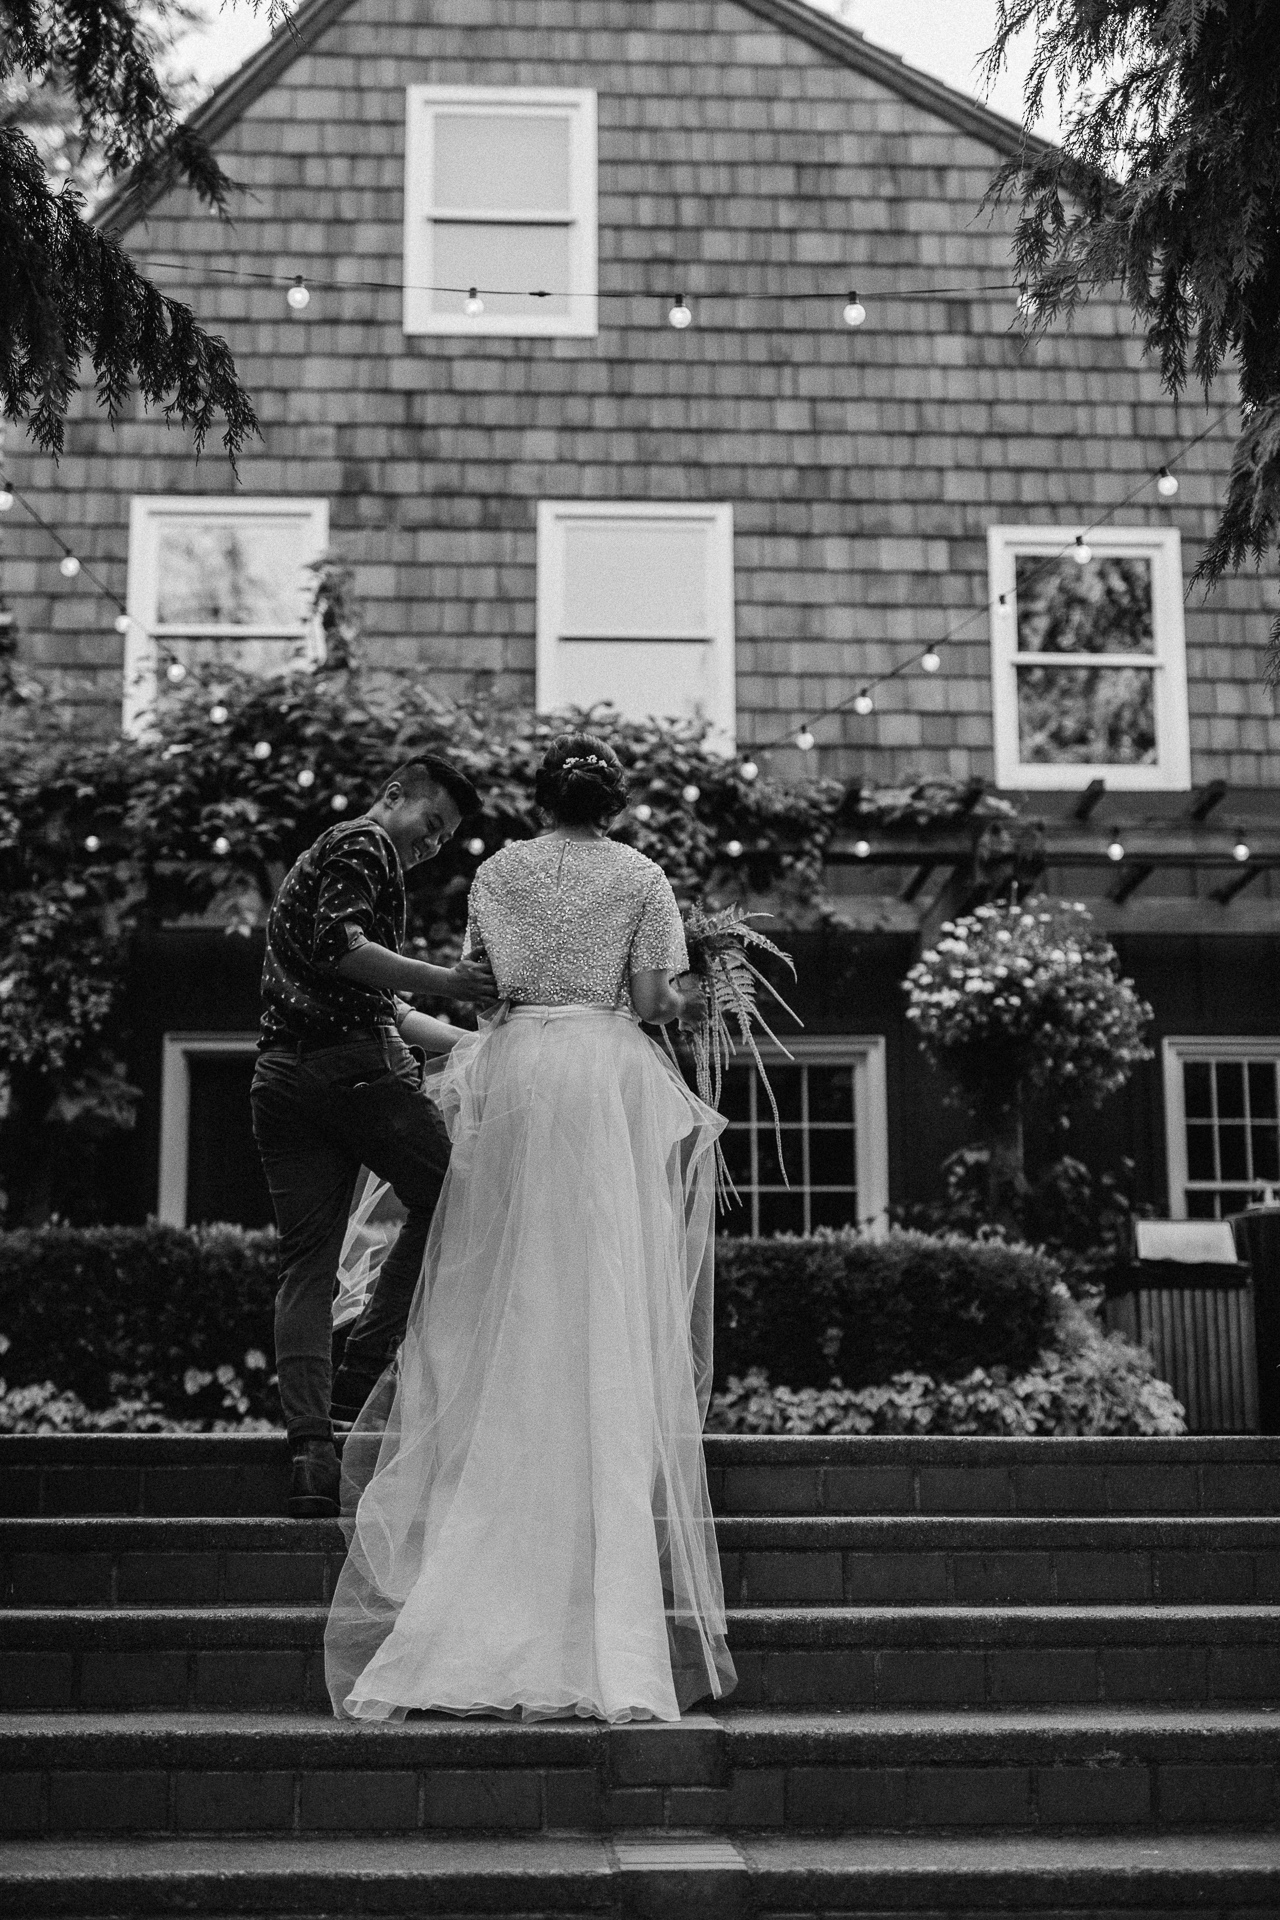 jess-hunter-seattle-artistic-wedding-photographer-5220.jpg